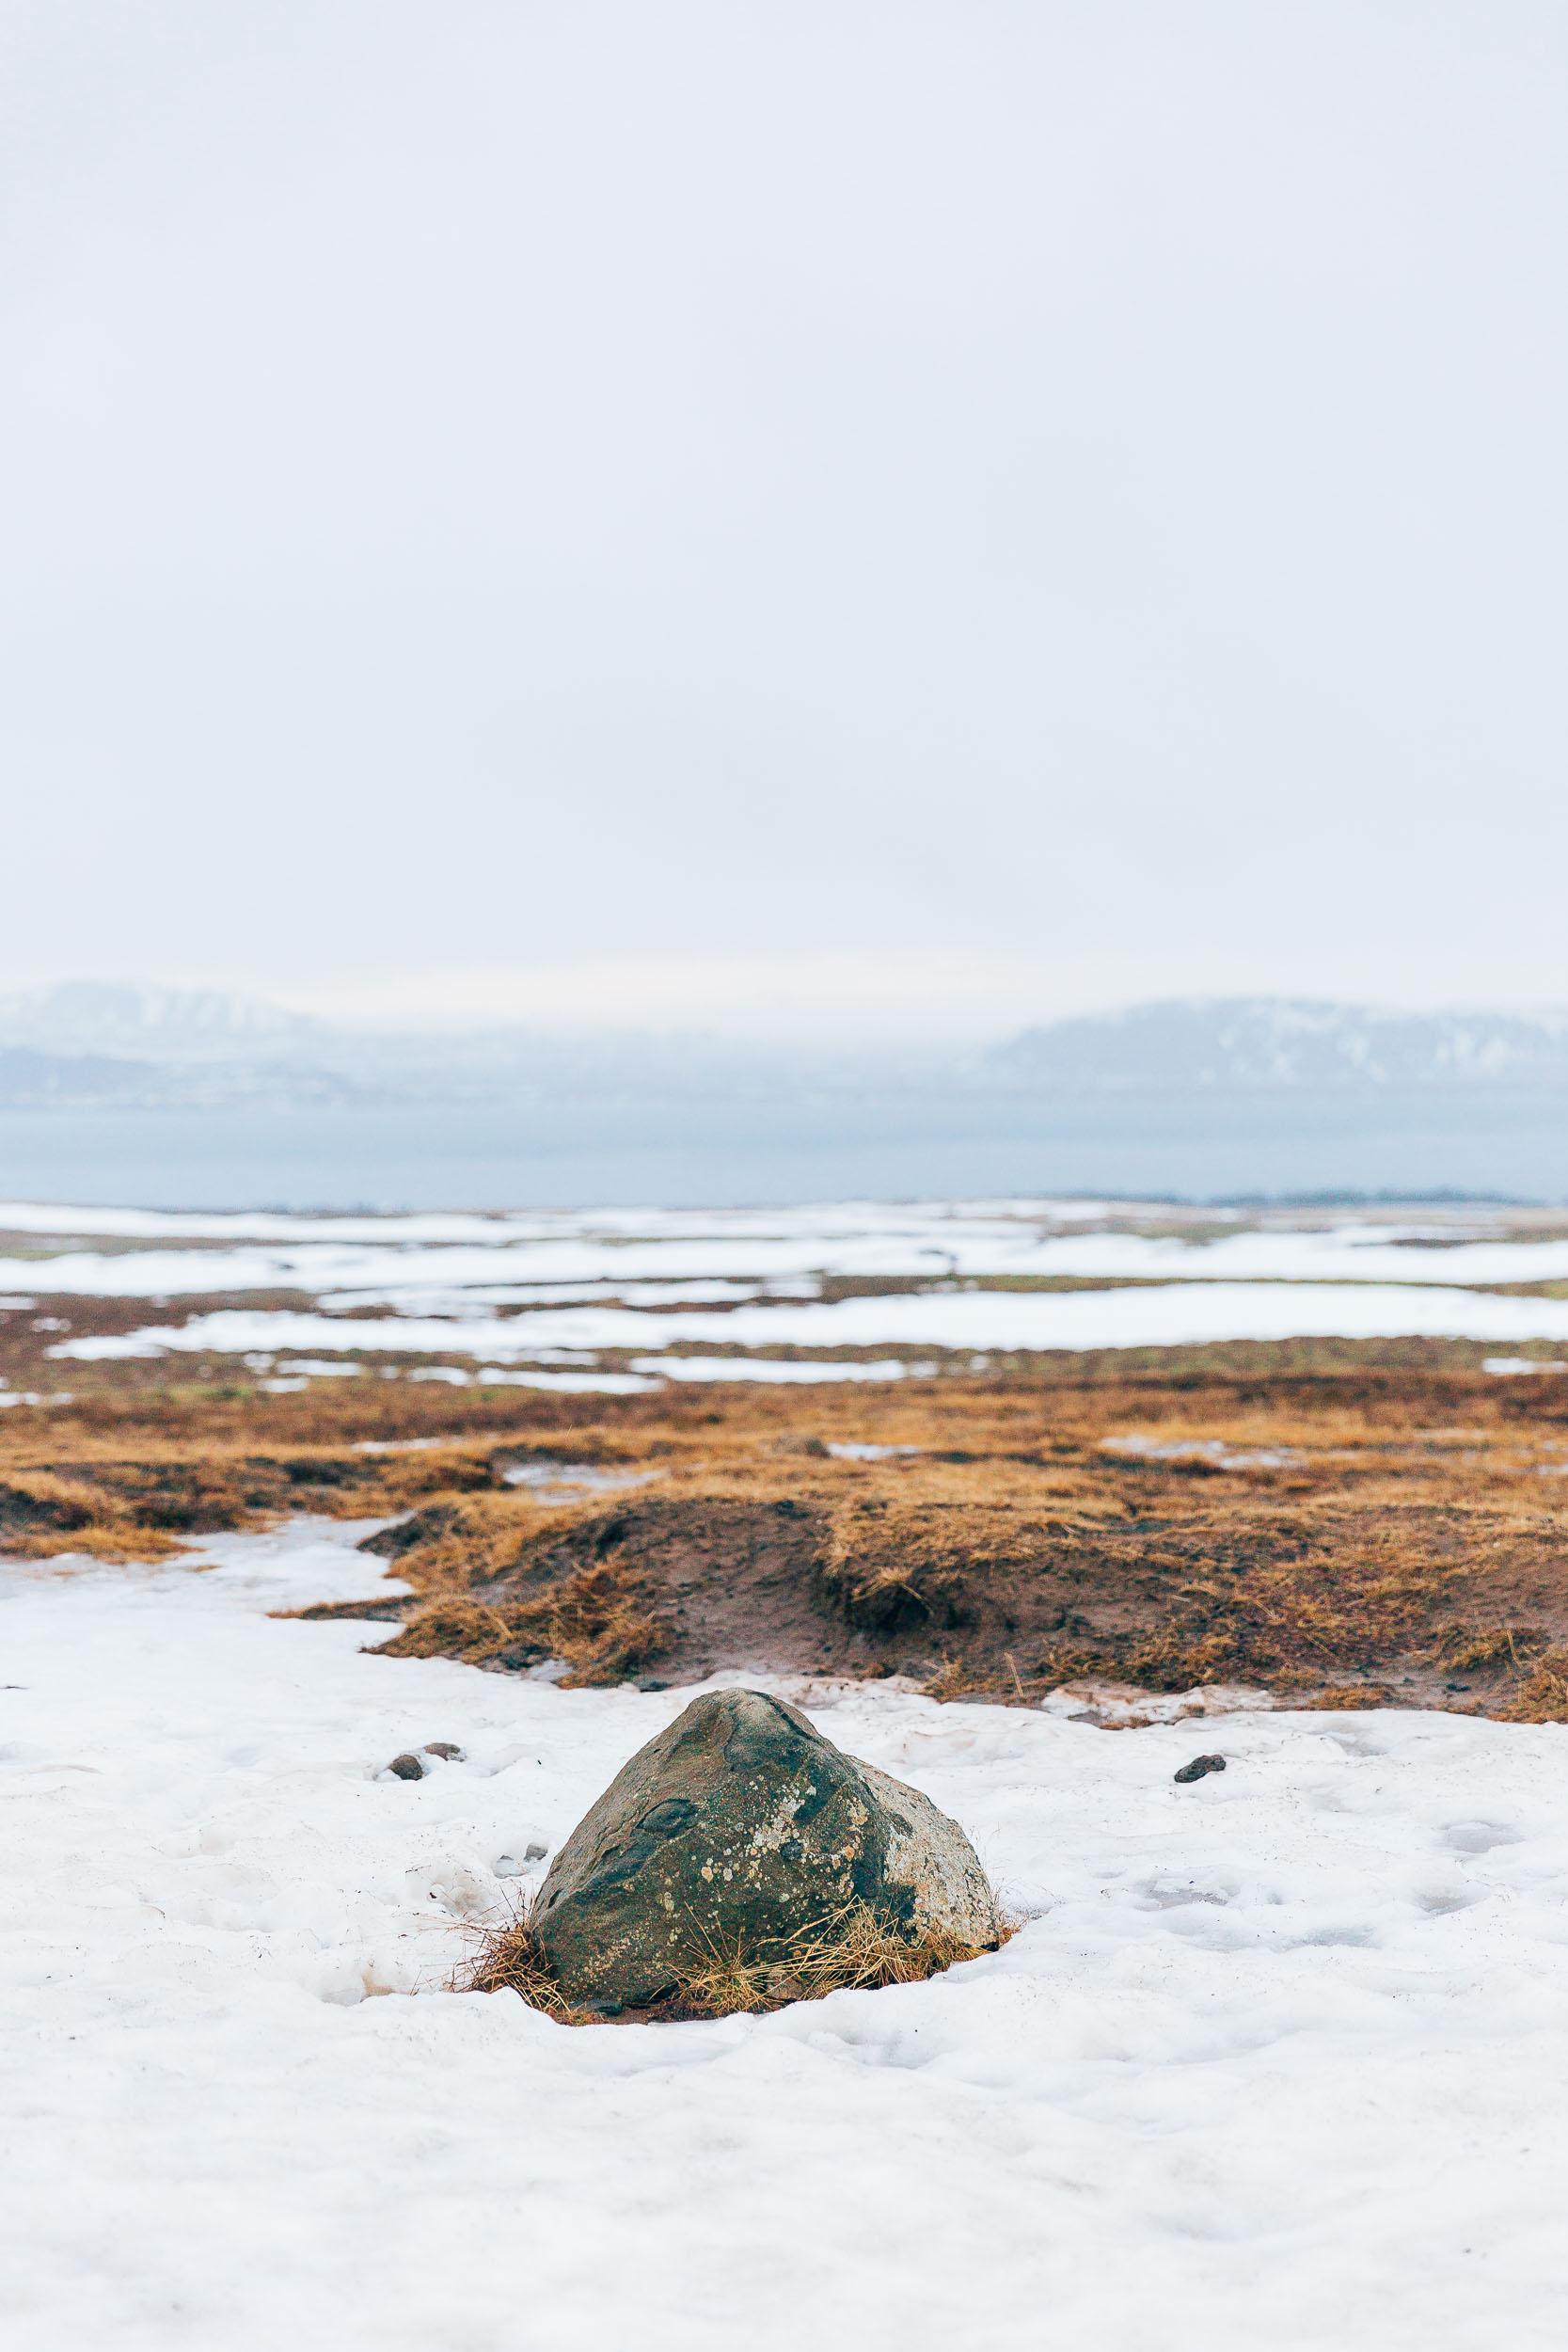 02_2019_Iceland-258.jpg